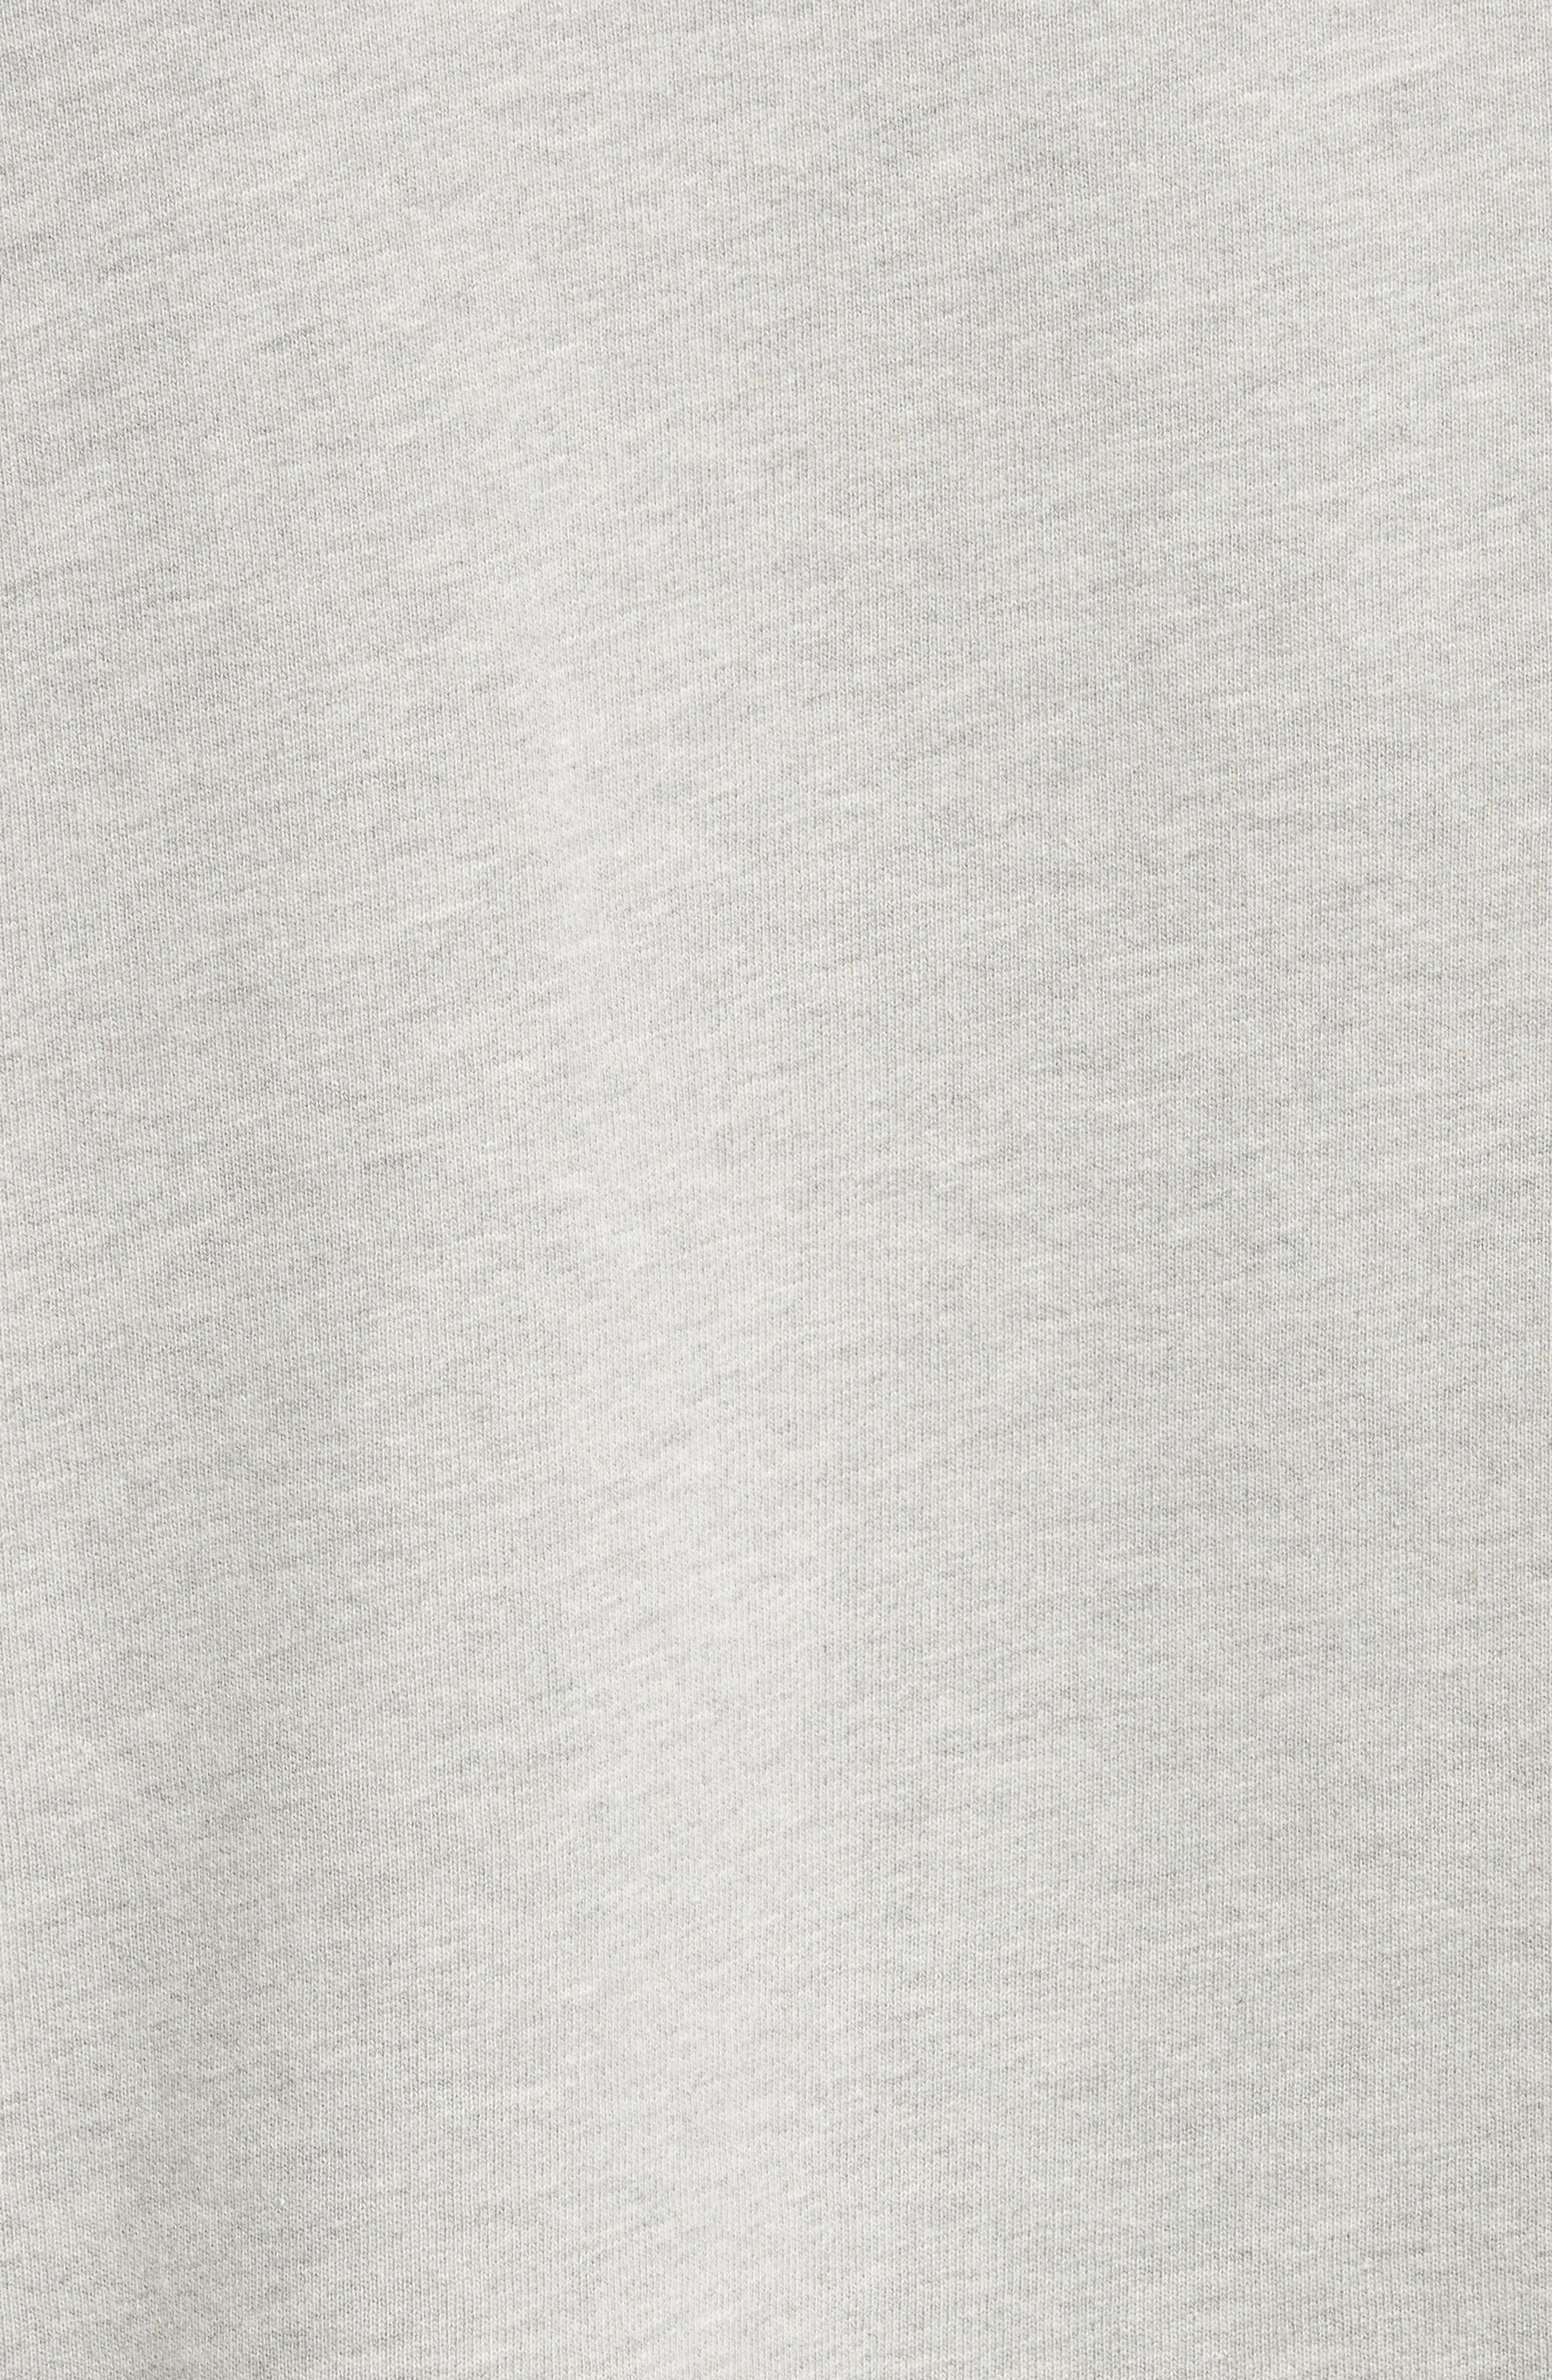 Bow Sweatshirt,                             Alternate thumbnail 5, color,                             021